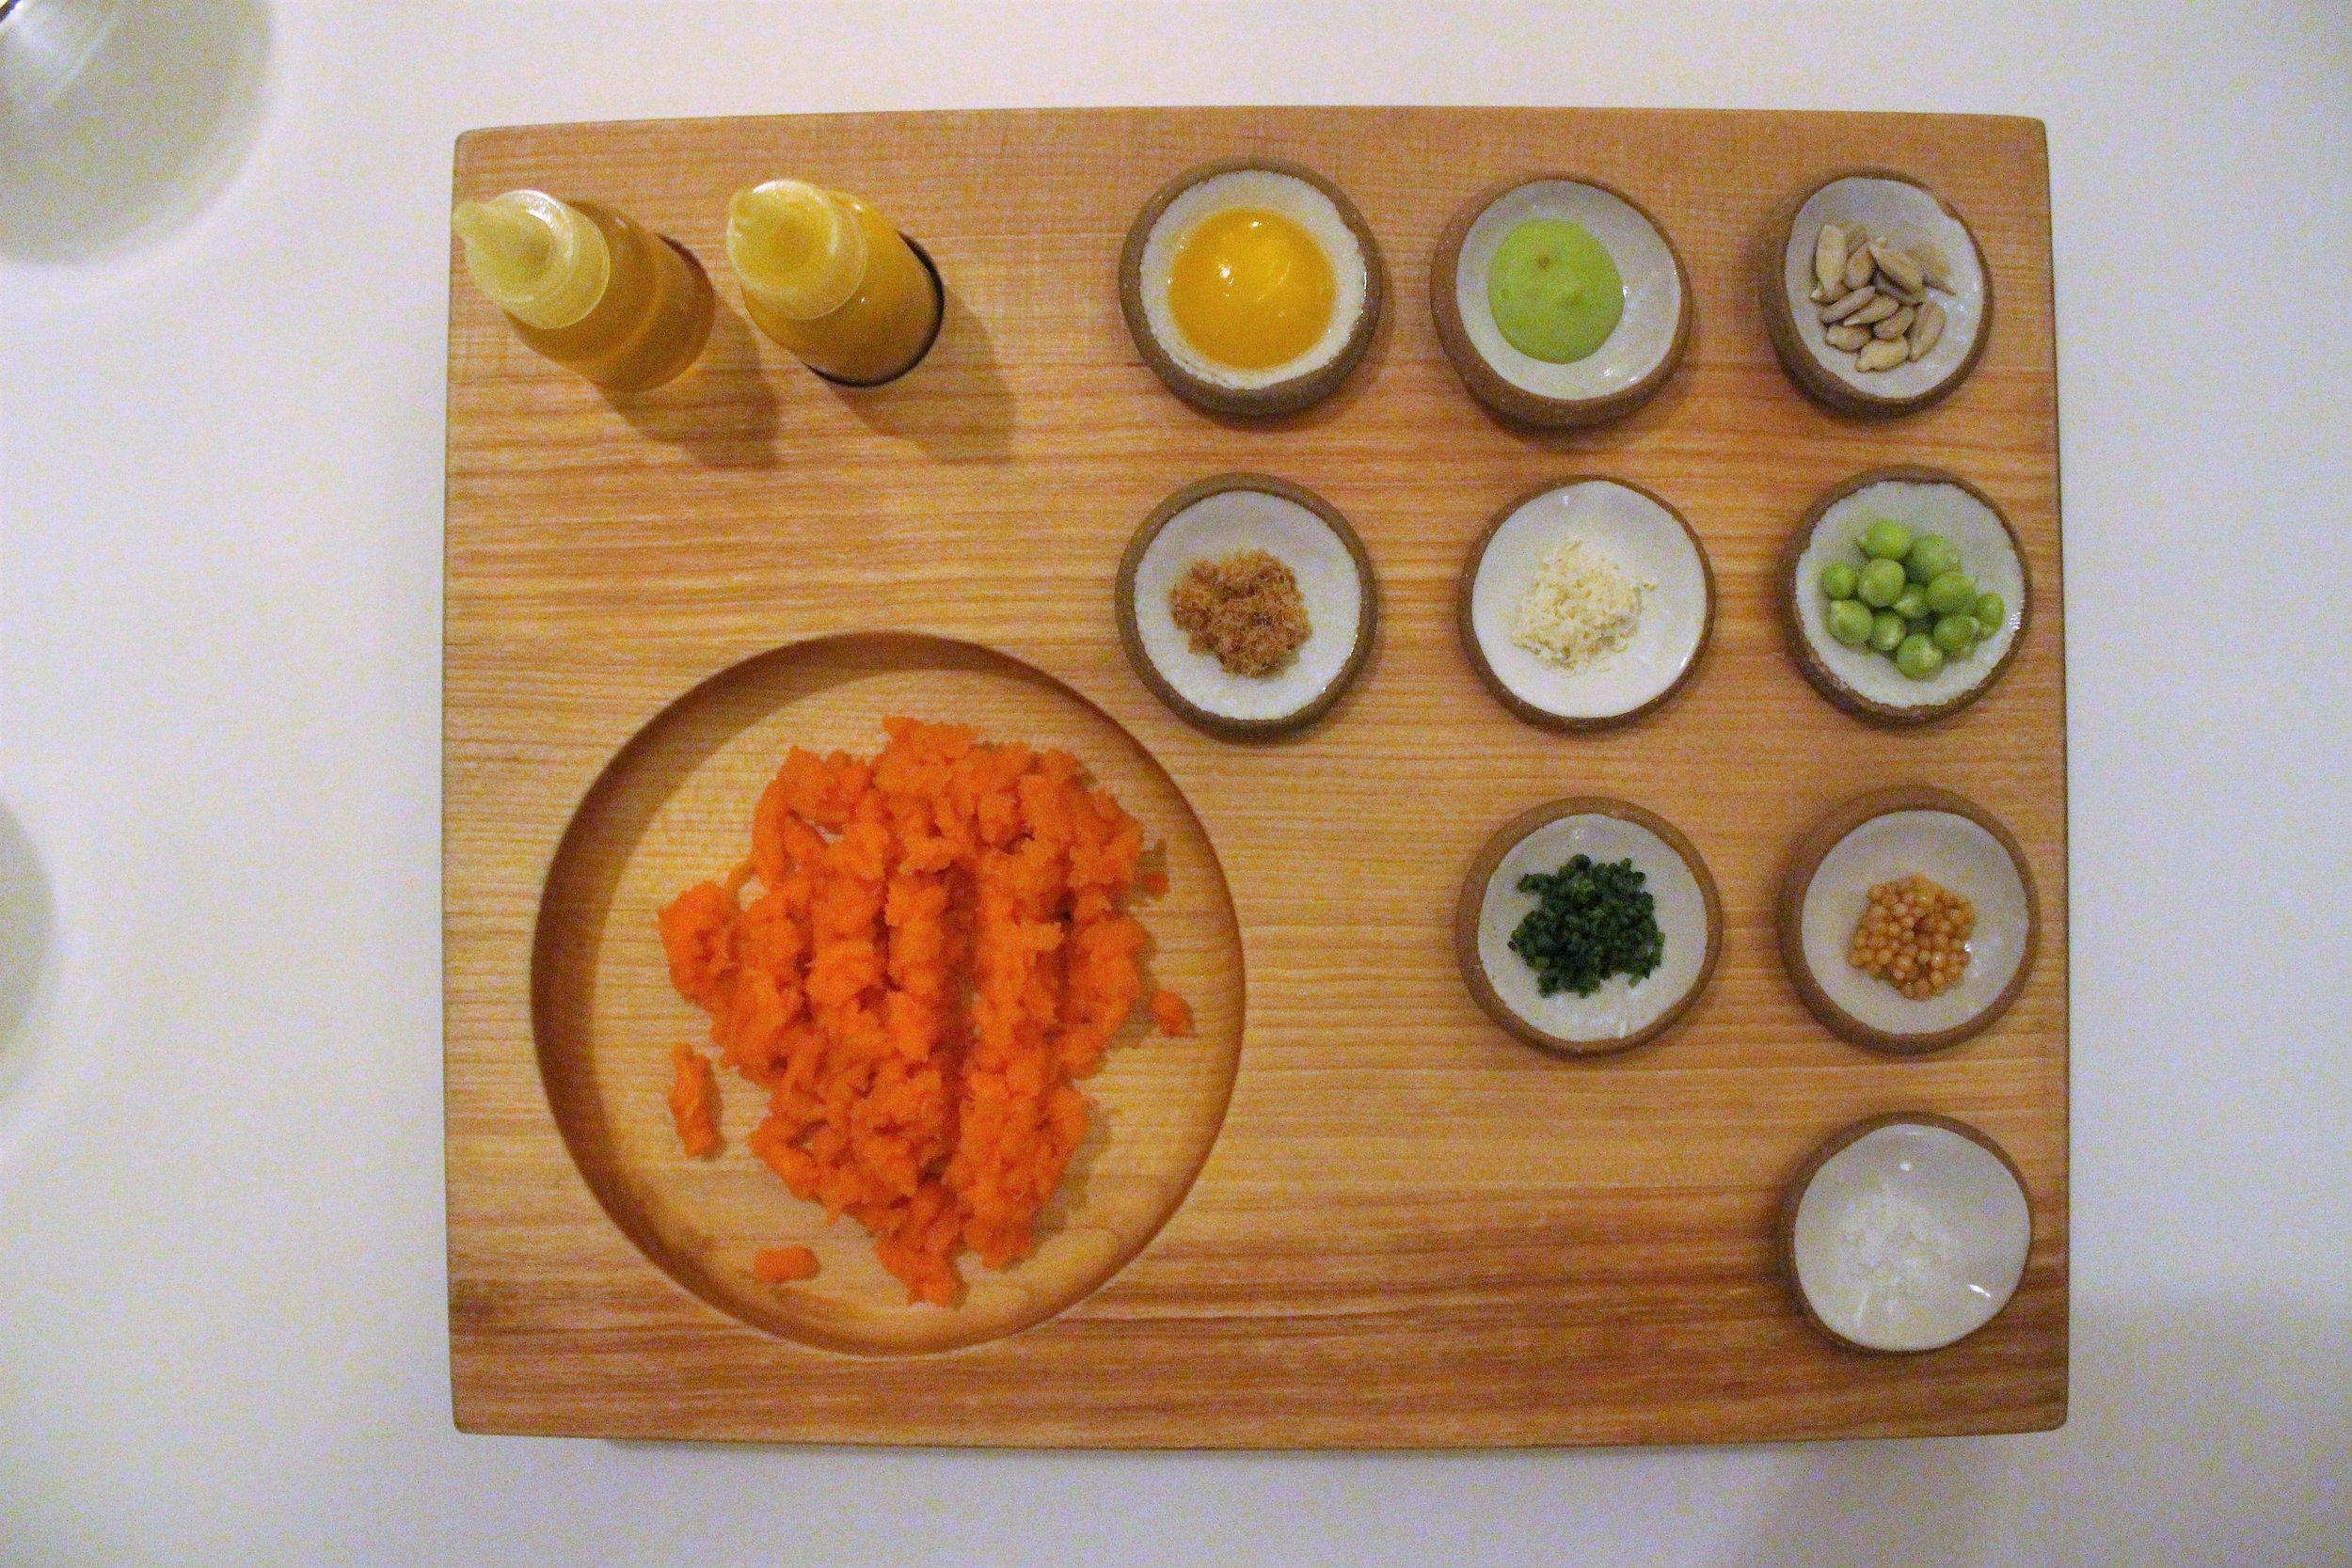 Carrot-Tartare-2012-at-Eleven-Madison-Park-in-New-York-City-6.JPG